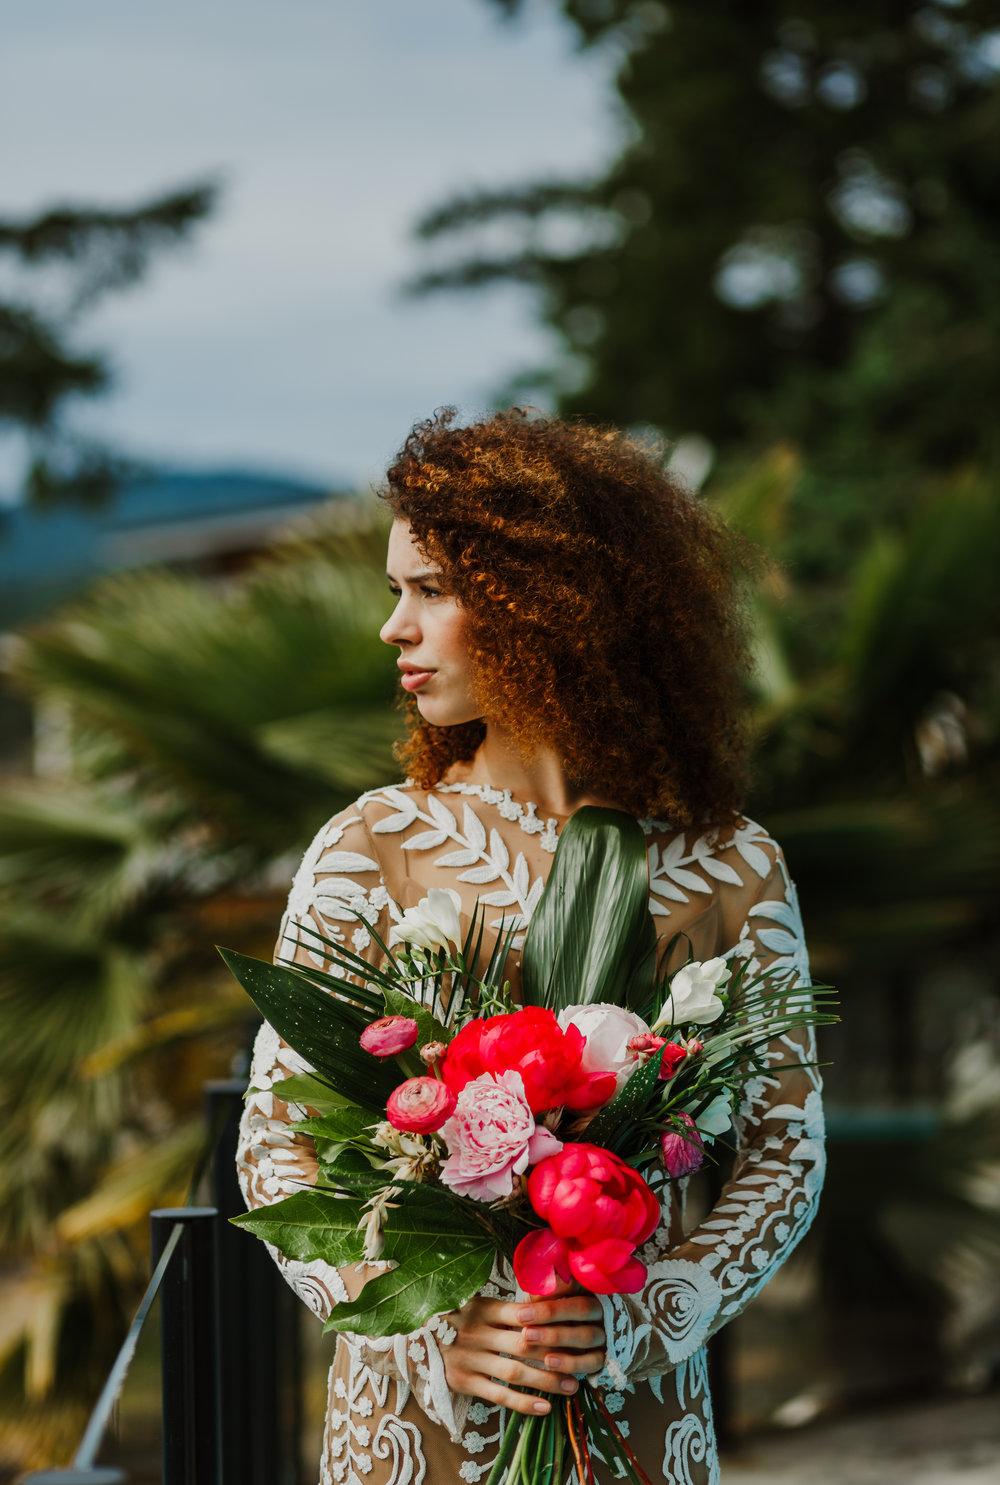 West Coast Bride - Vancouver Wedding Photographer & Videographer - Sunshine Coast Wedding Photos - Sunshine Coast Wedding Photographer - Jennifer Picard Photography - IMG_6307.jpg